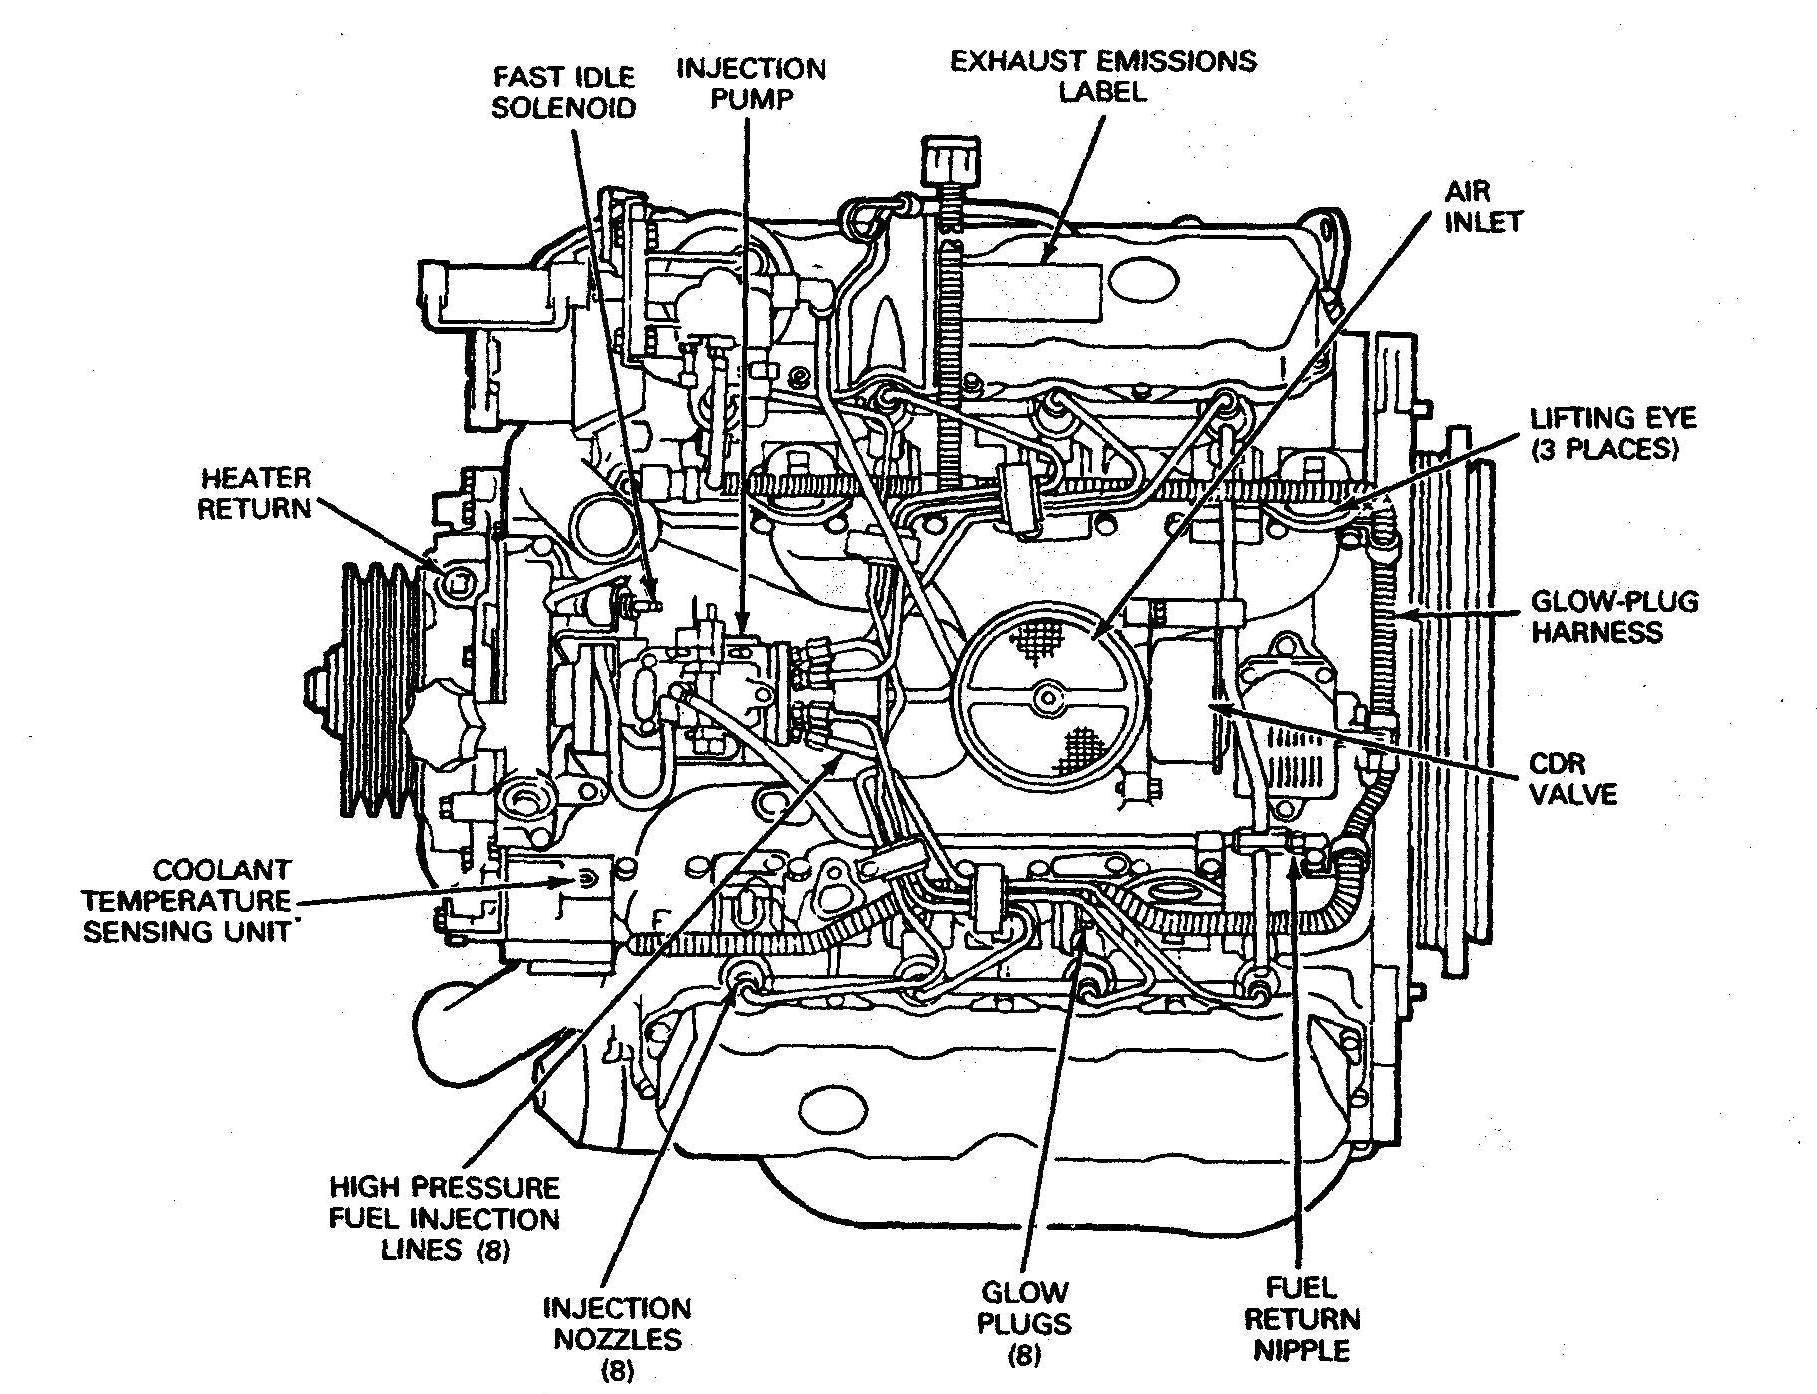 Cummins Engine Diagram Diesel Engine Diagram Wiring Of A Motor 6 2 Generator Tractor Of Cummins Engine Diagram